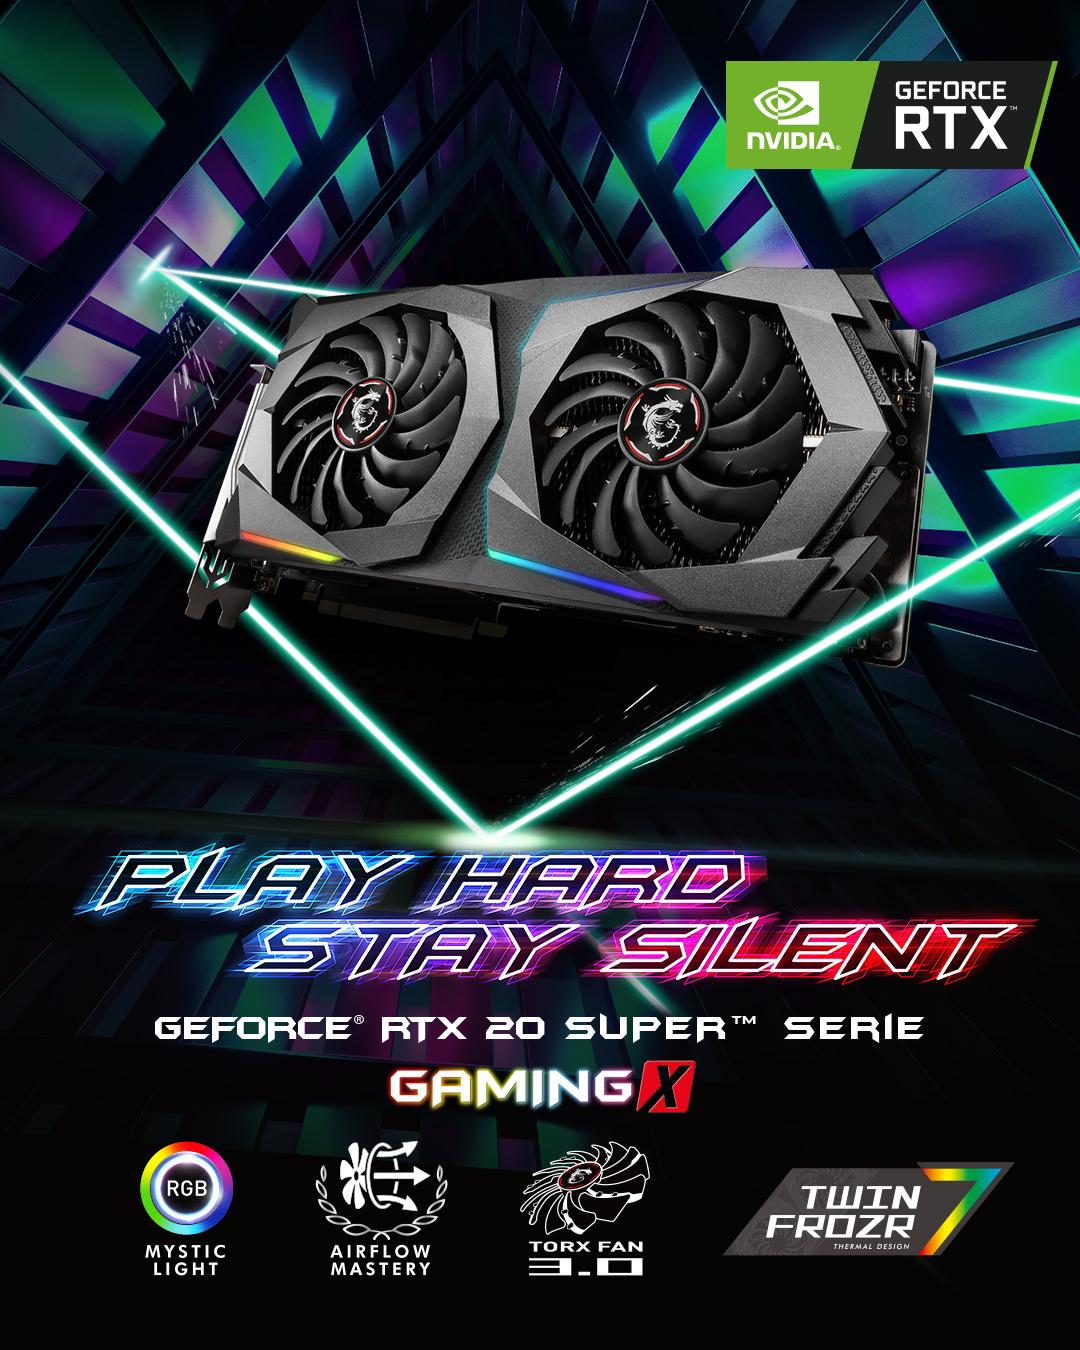 Nvidia GeForce RTX 20 SUPER Gaming Serie